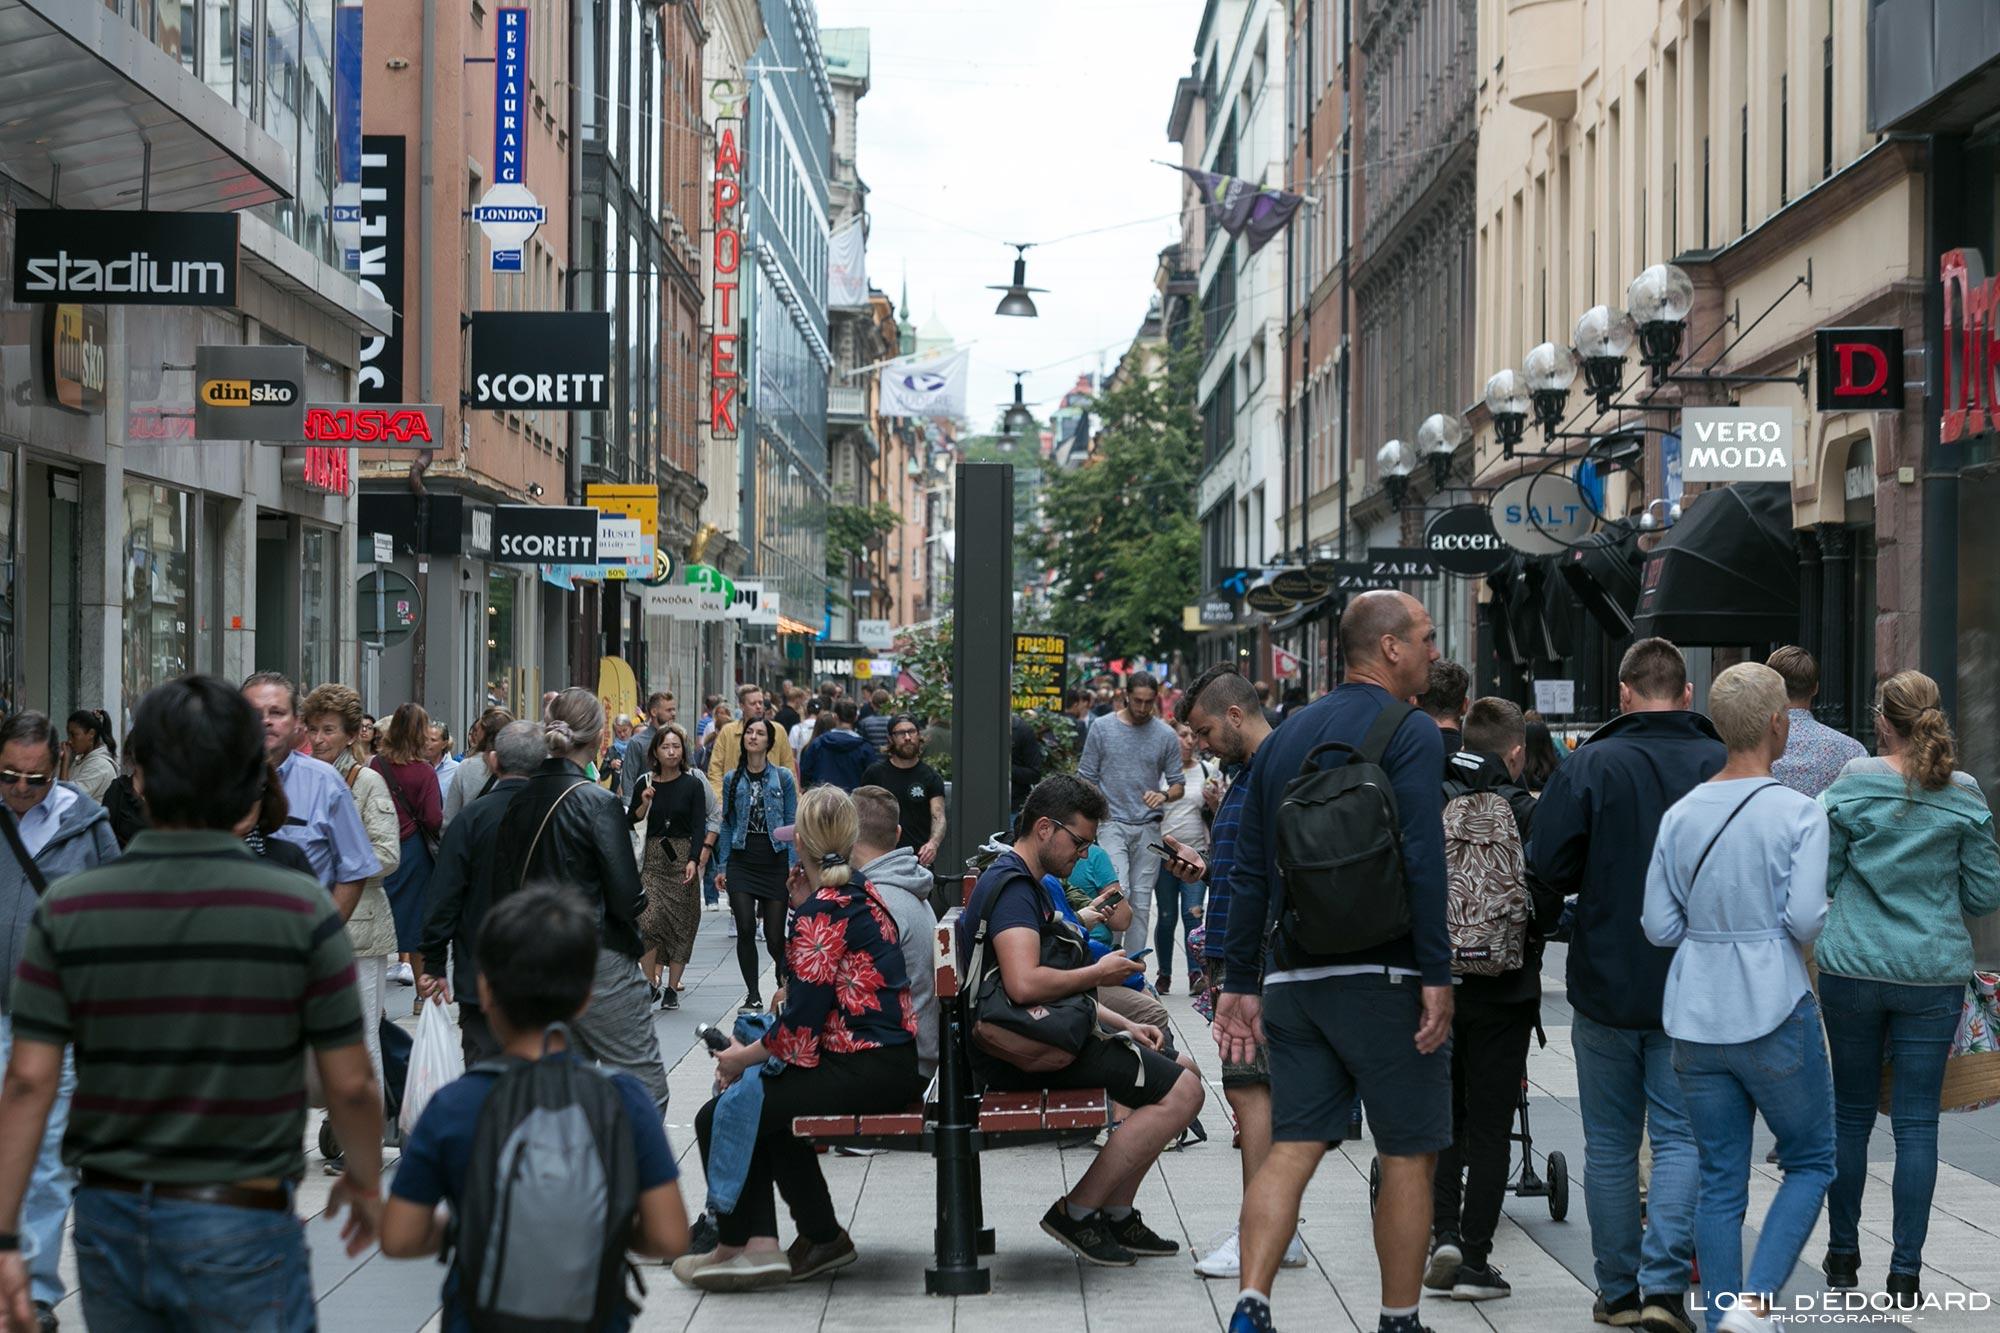 Rue commerçante Drottninggatan Norrmalm Stockholm Suède Sweden Sverige shopping street